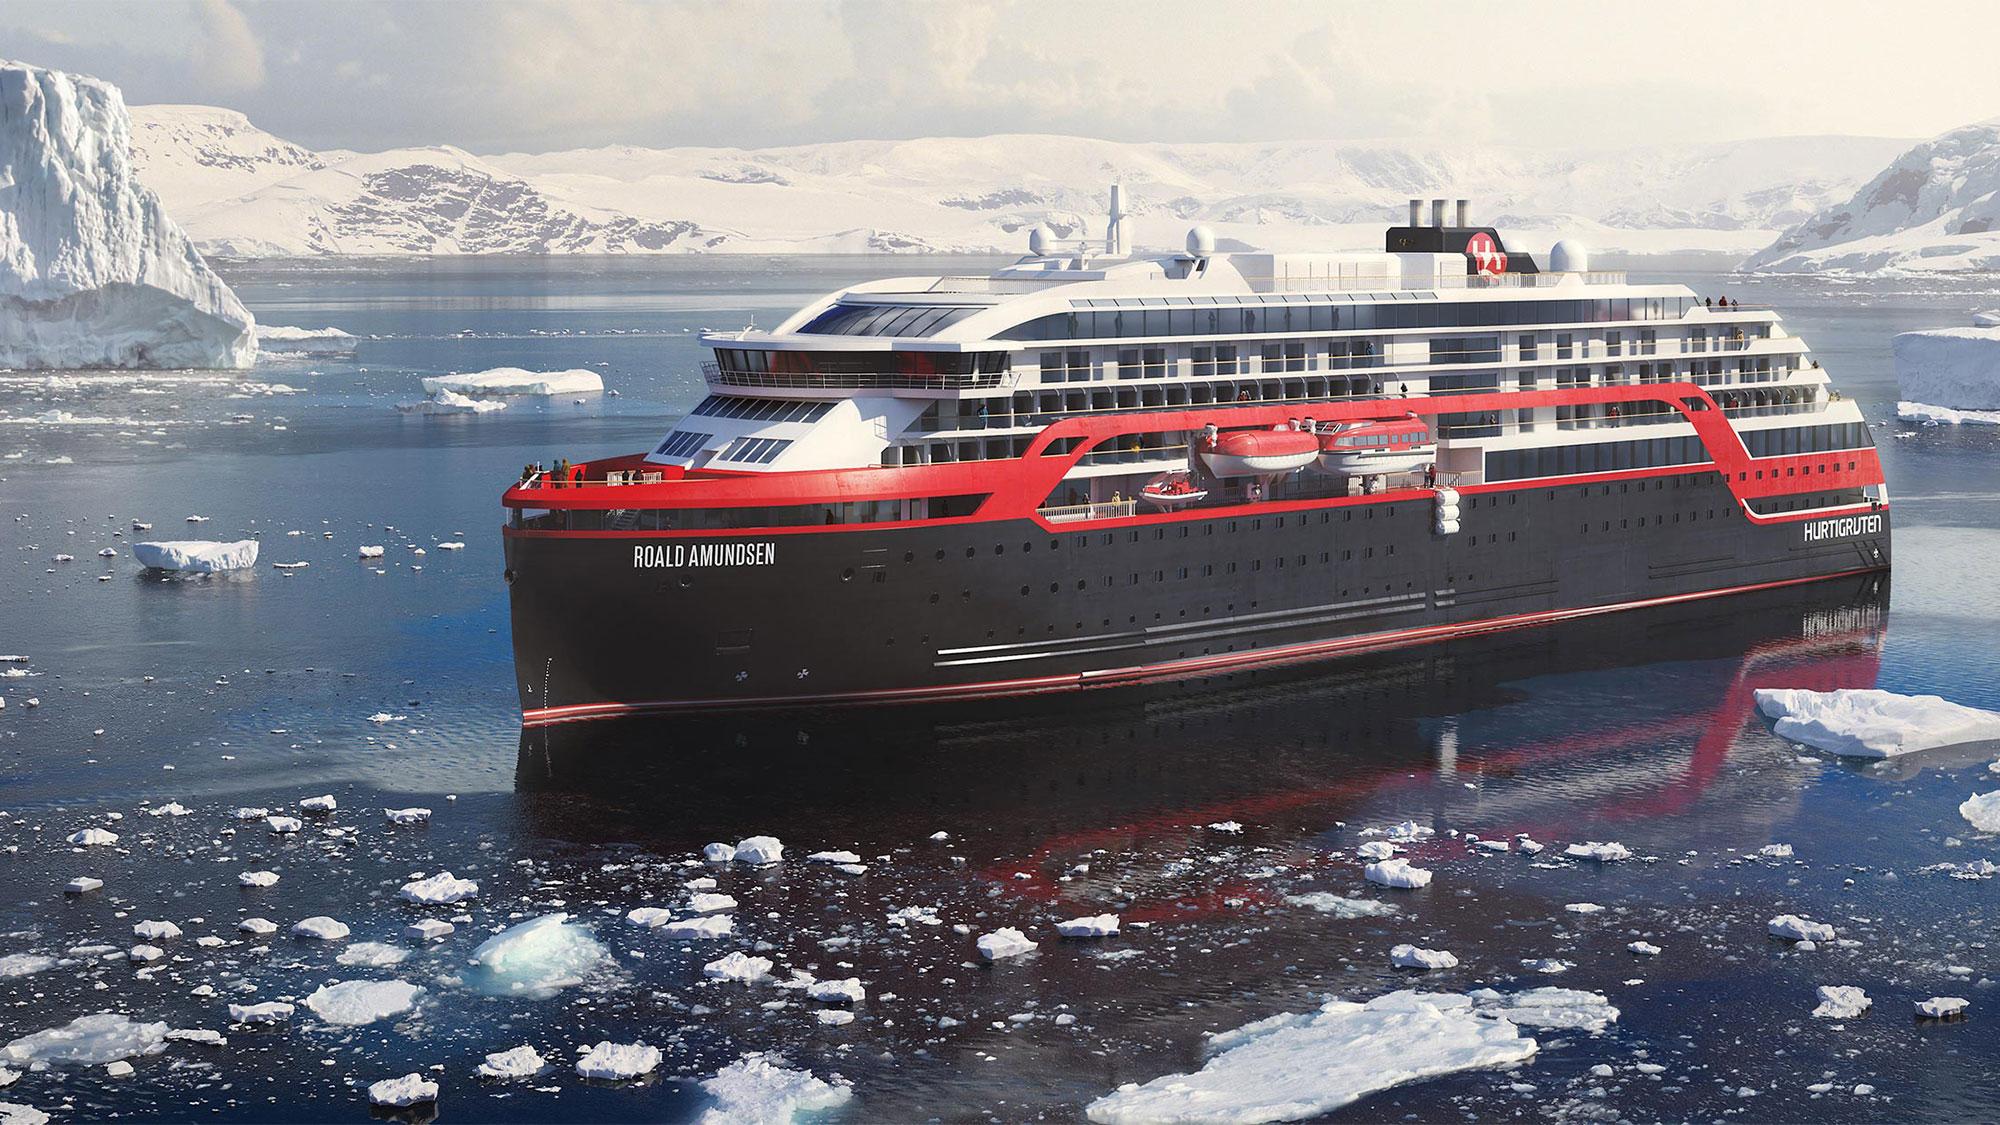 Hurtigruten To Use Hybrid Ships To Cut Emissions Travel